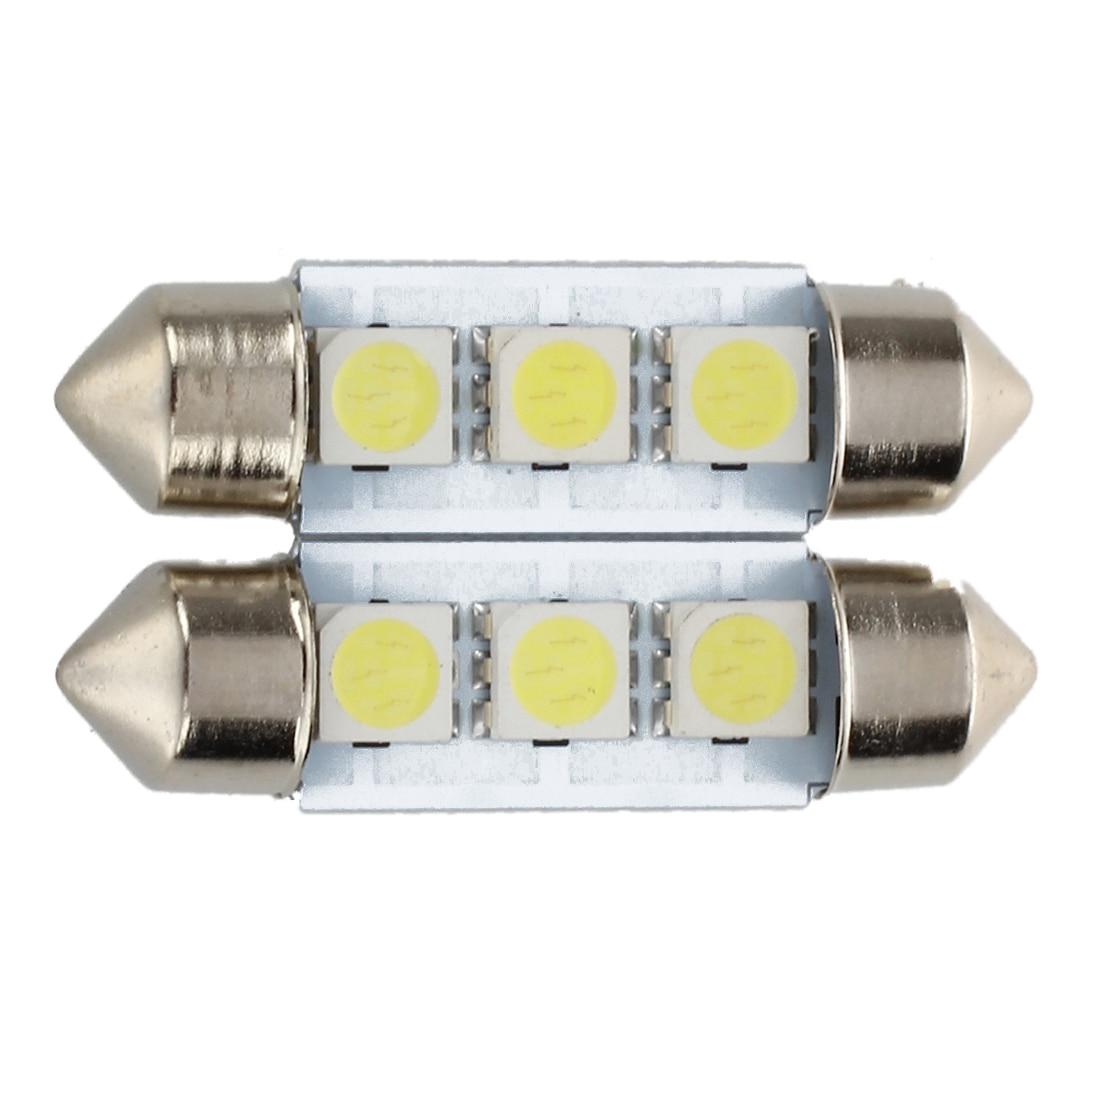 2x c5w 3 led smd 5050 36mm xenon branco lâmpada placa shuttle festão cúpula lâmpada do teto luz carro